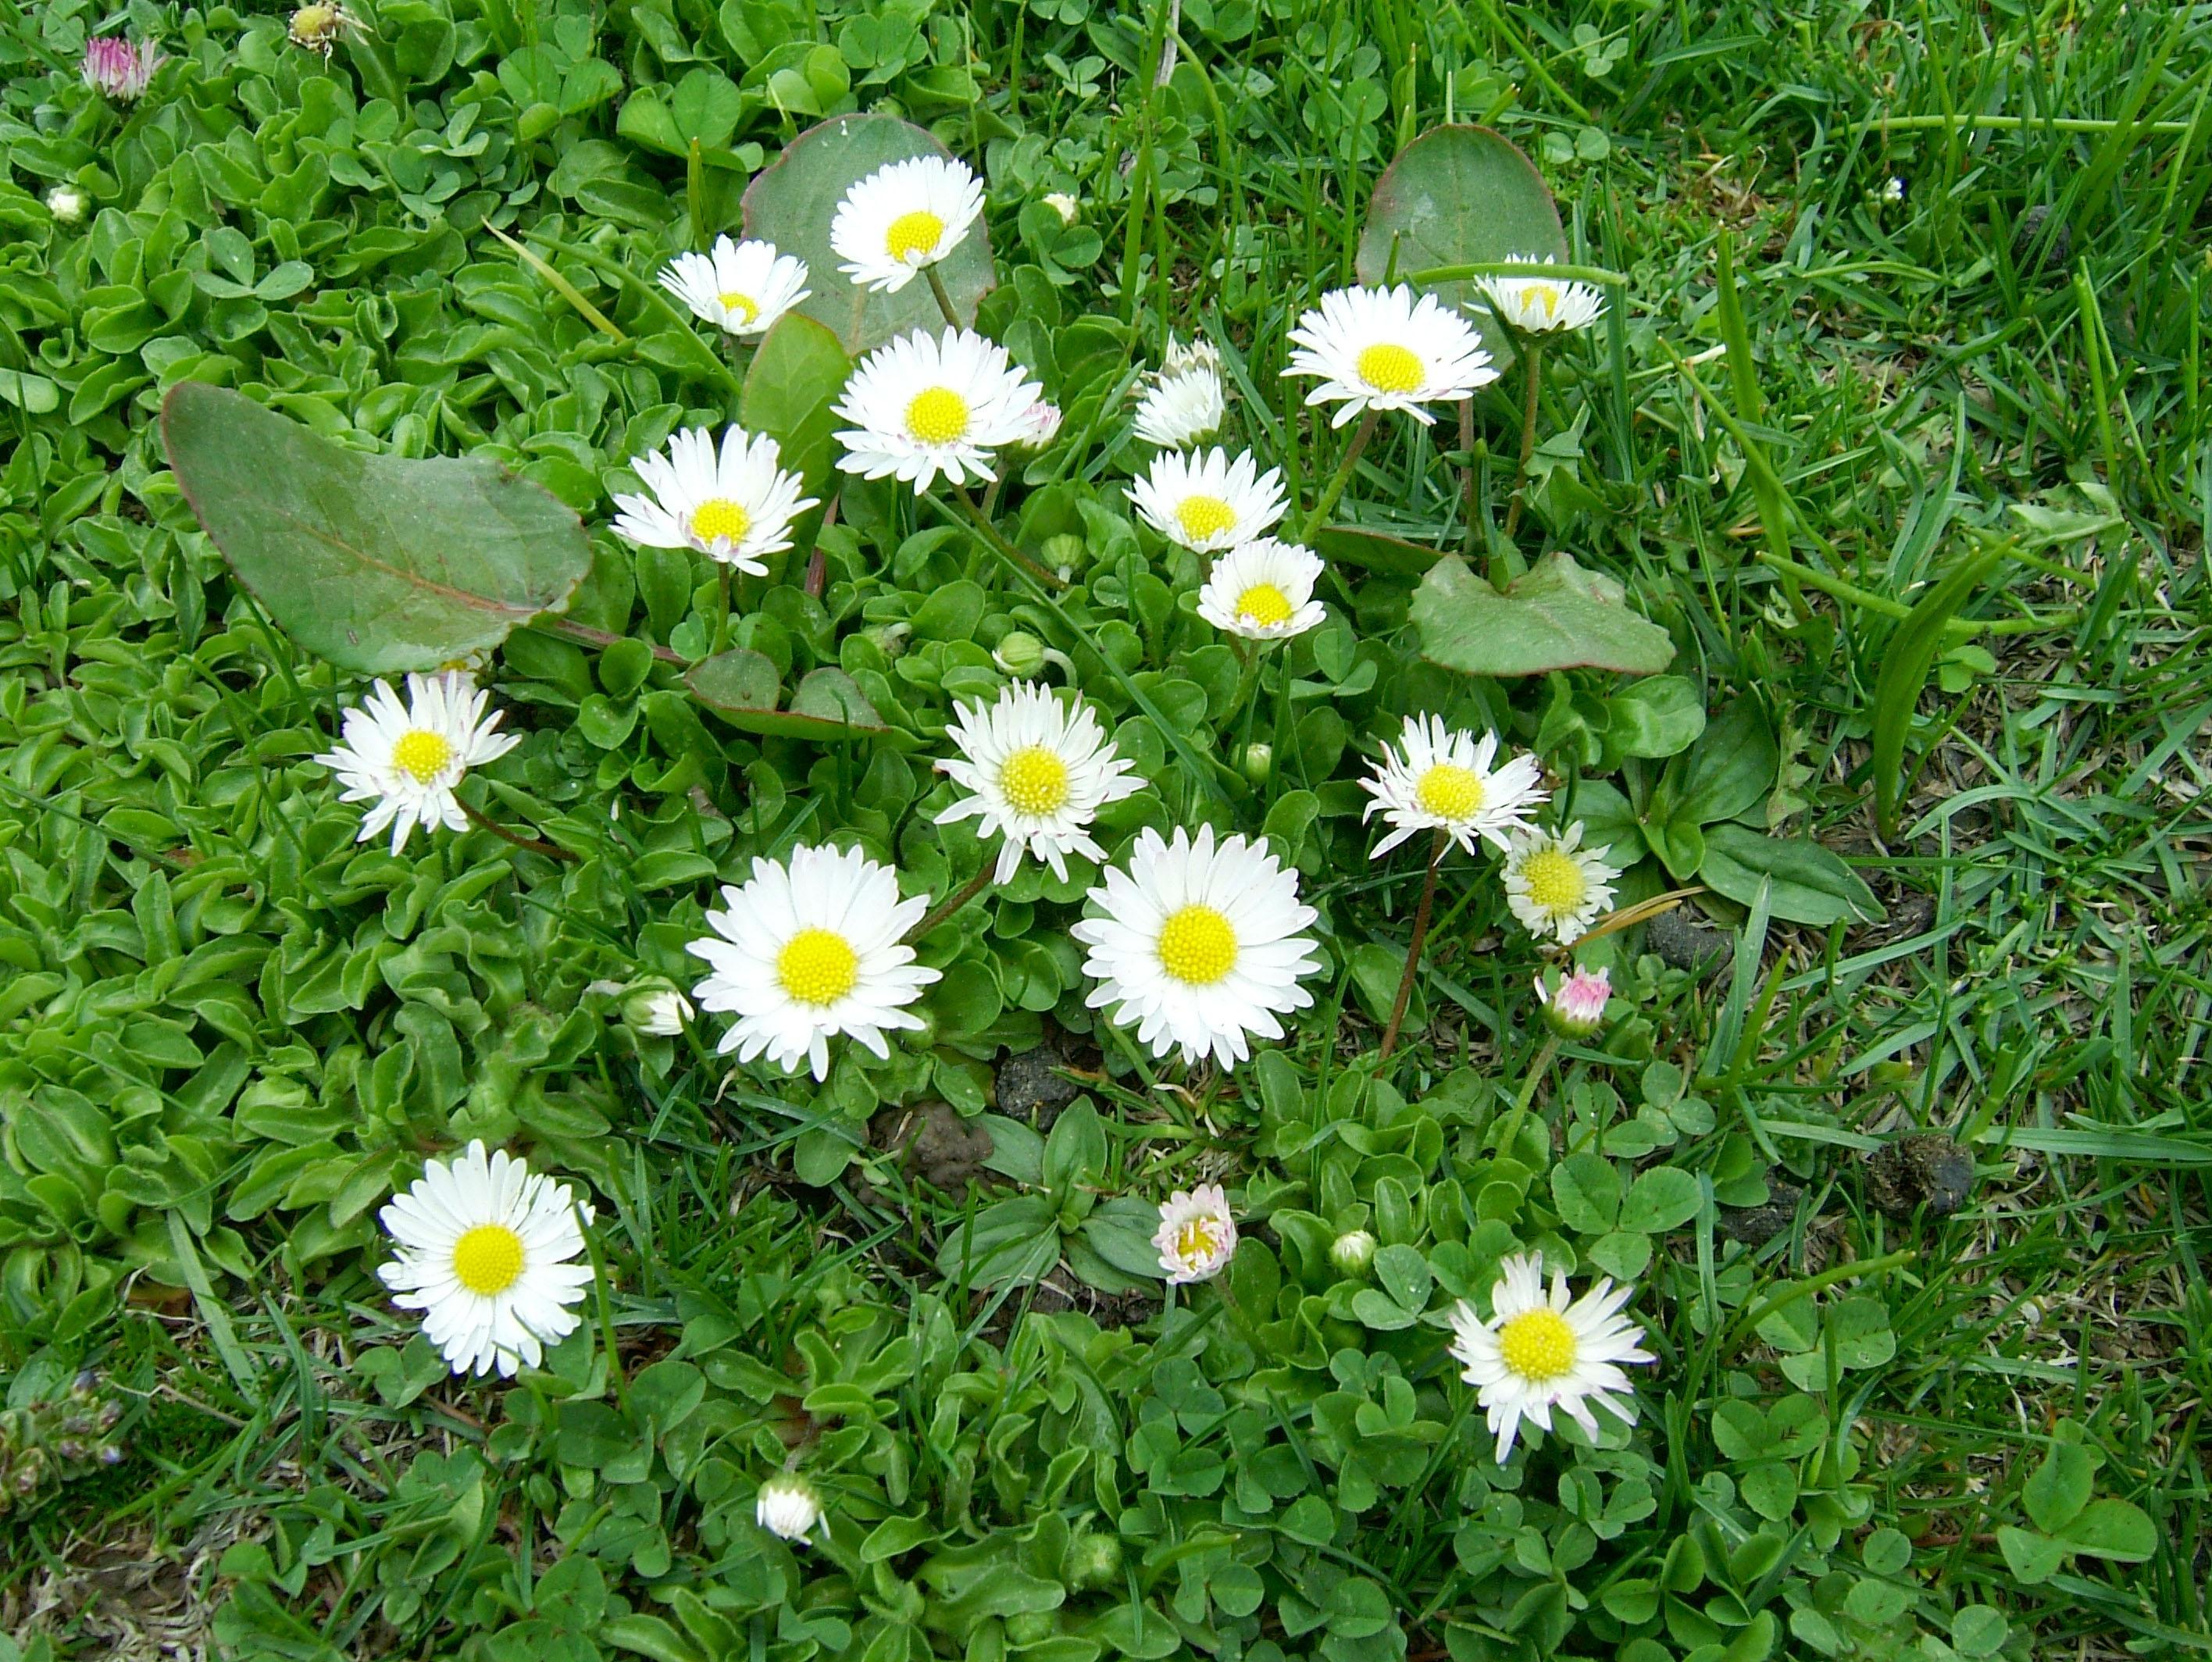 Local Wild spring flowers Srinagar Kashmir India 08